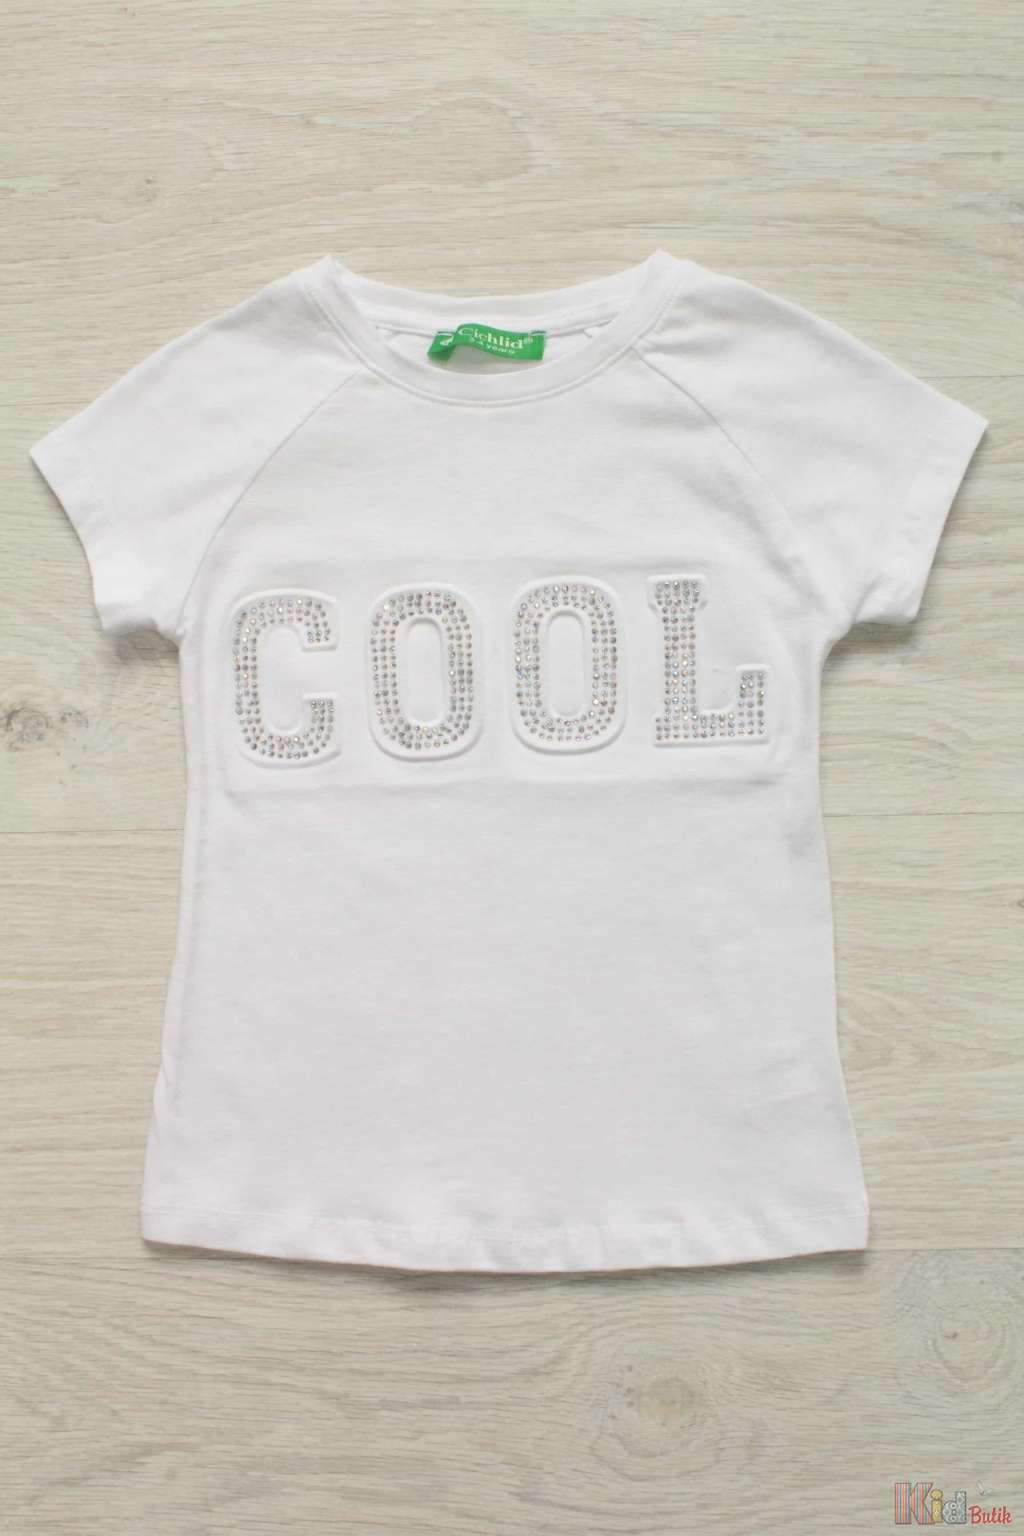 ᐈ Футболка для дівчинки «Cool. White.» Cichlid 2125000485379 купити ... 9fa174509c8aa